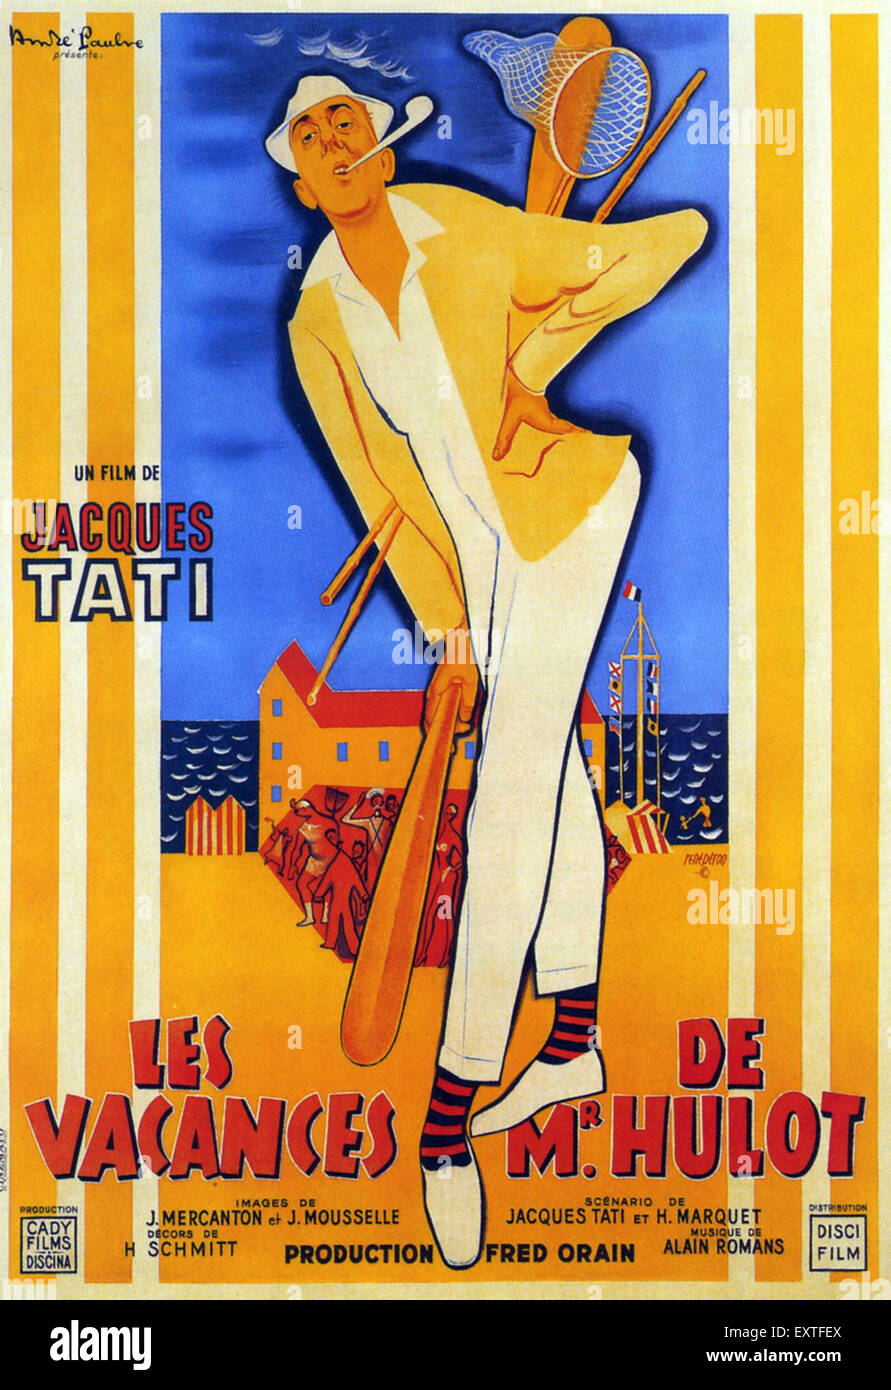 1950s france les vacances de monsieur hulot film poster stock photo royalty free image. Black Bedroom Furniture Sets. Home Design Ideas